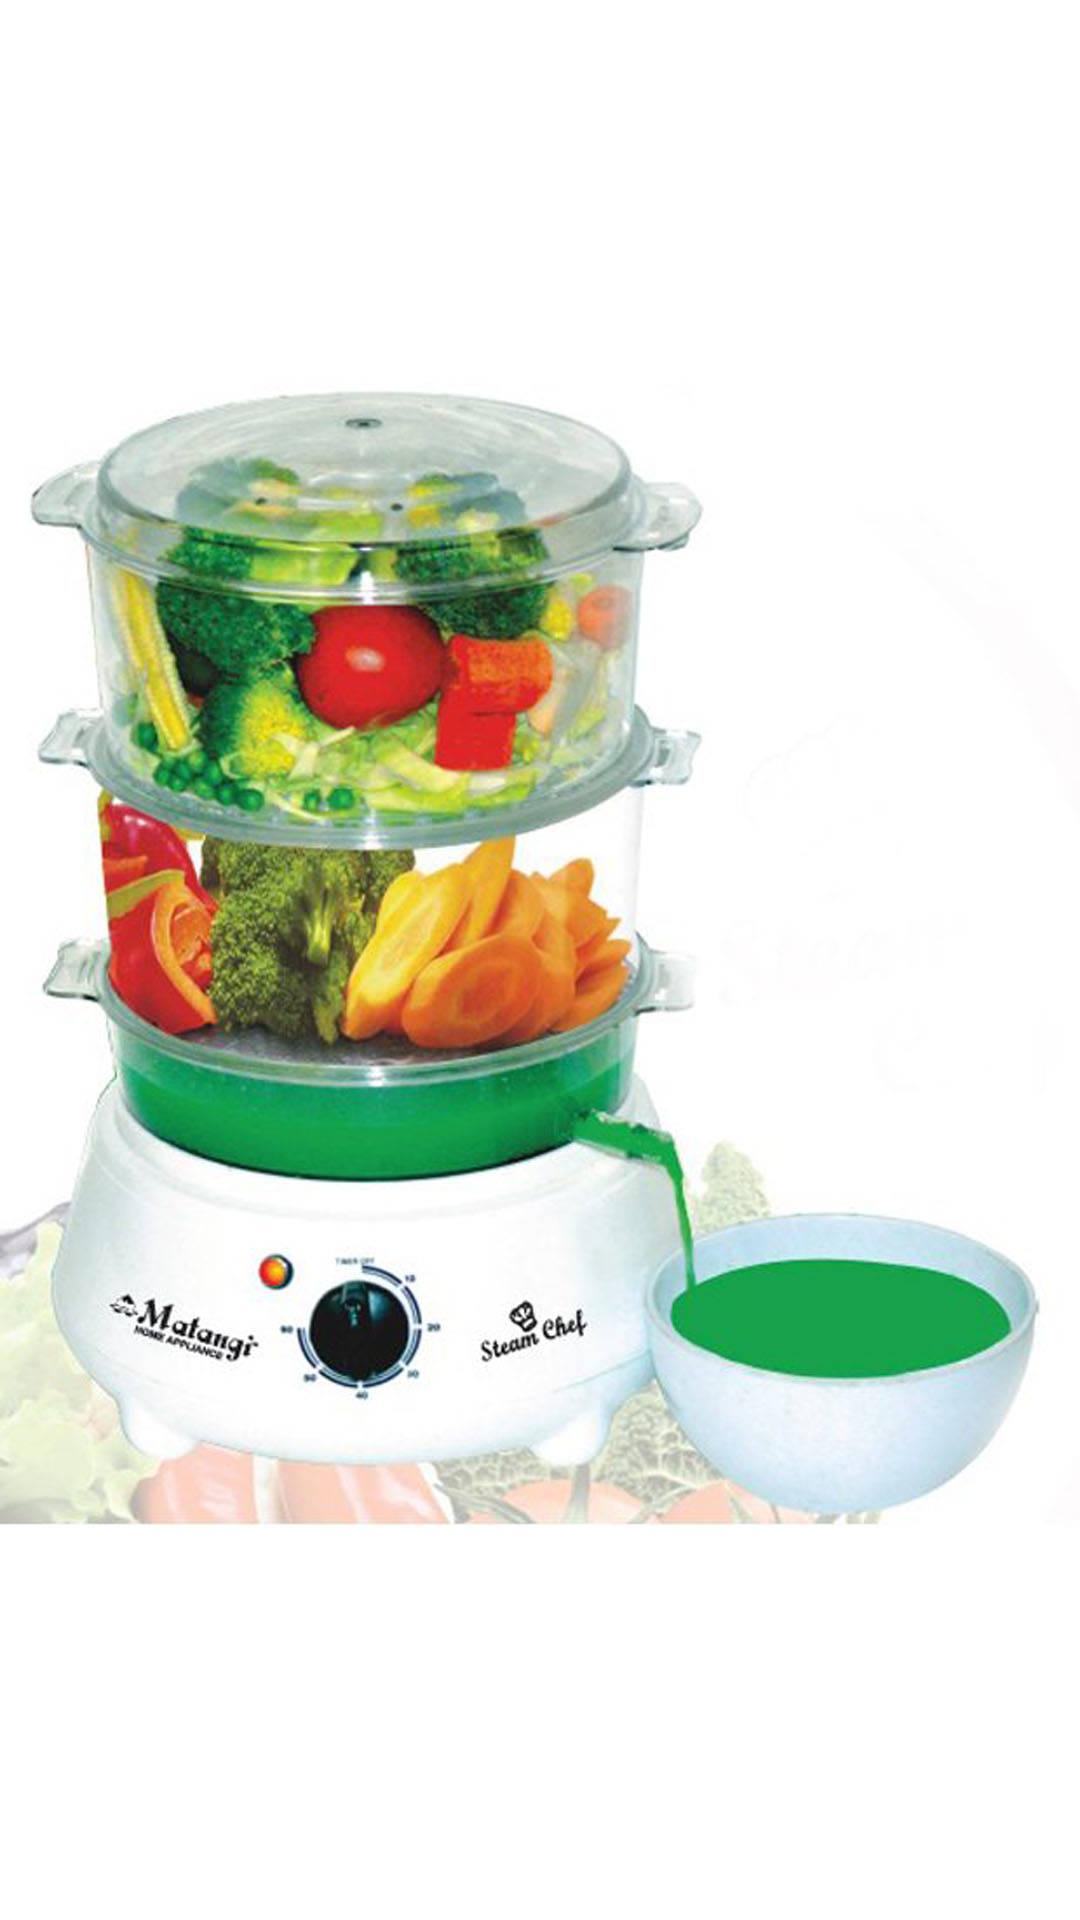 Matangi 2.4 Litre 600W Food Steamer